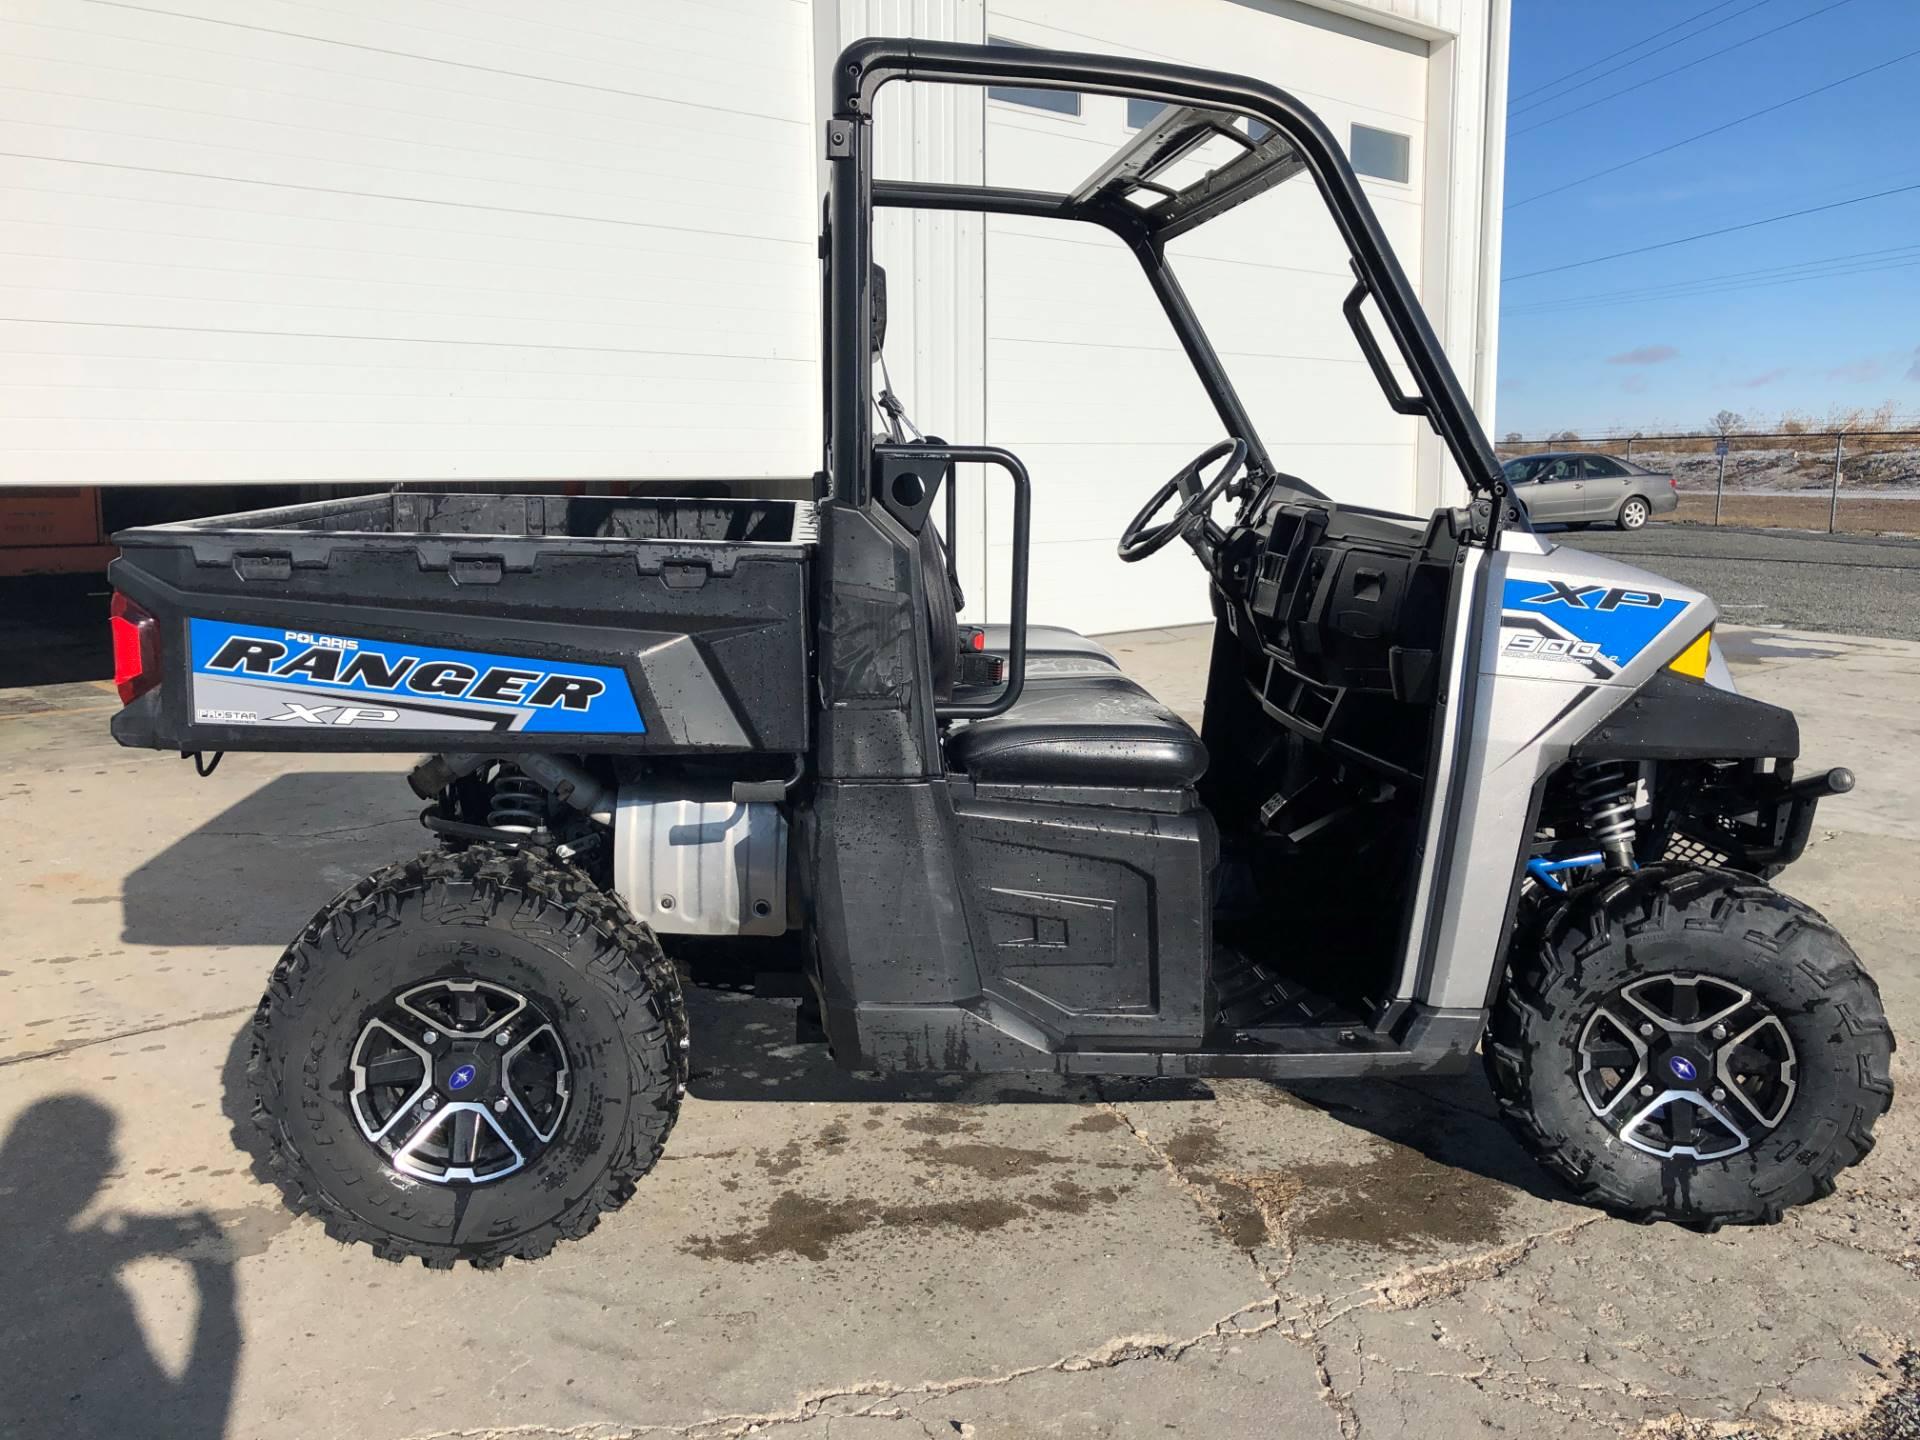 2017 Polaris Ranger Xp 900 Eps In Scottsbluff Nebraska